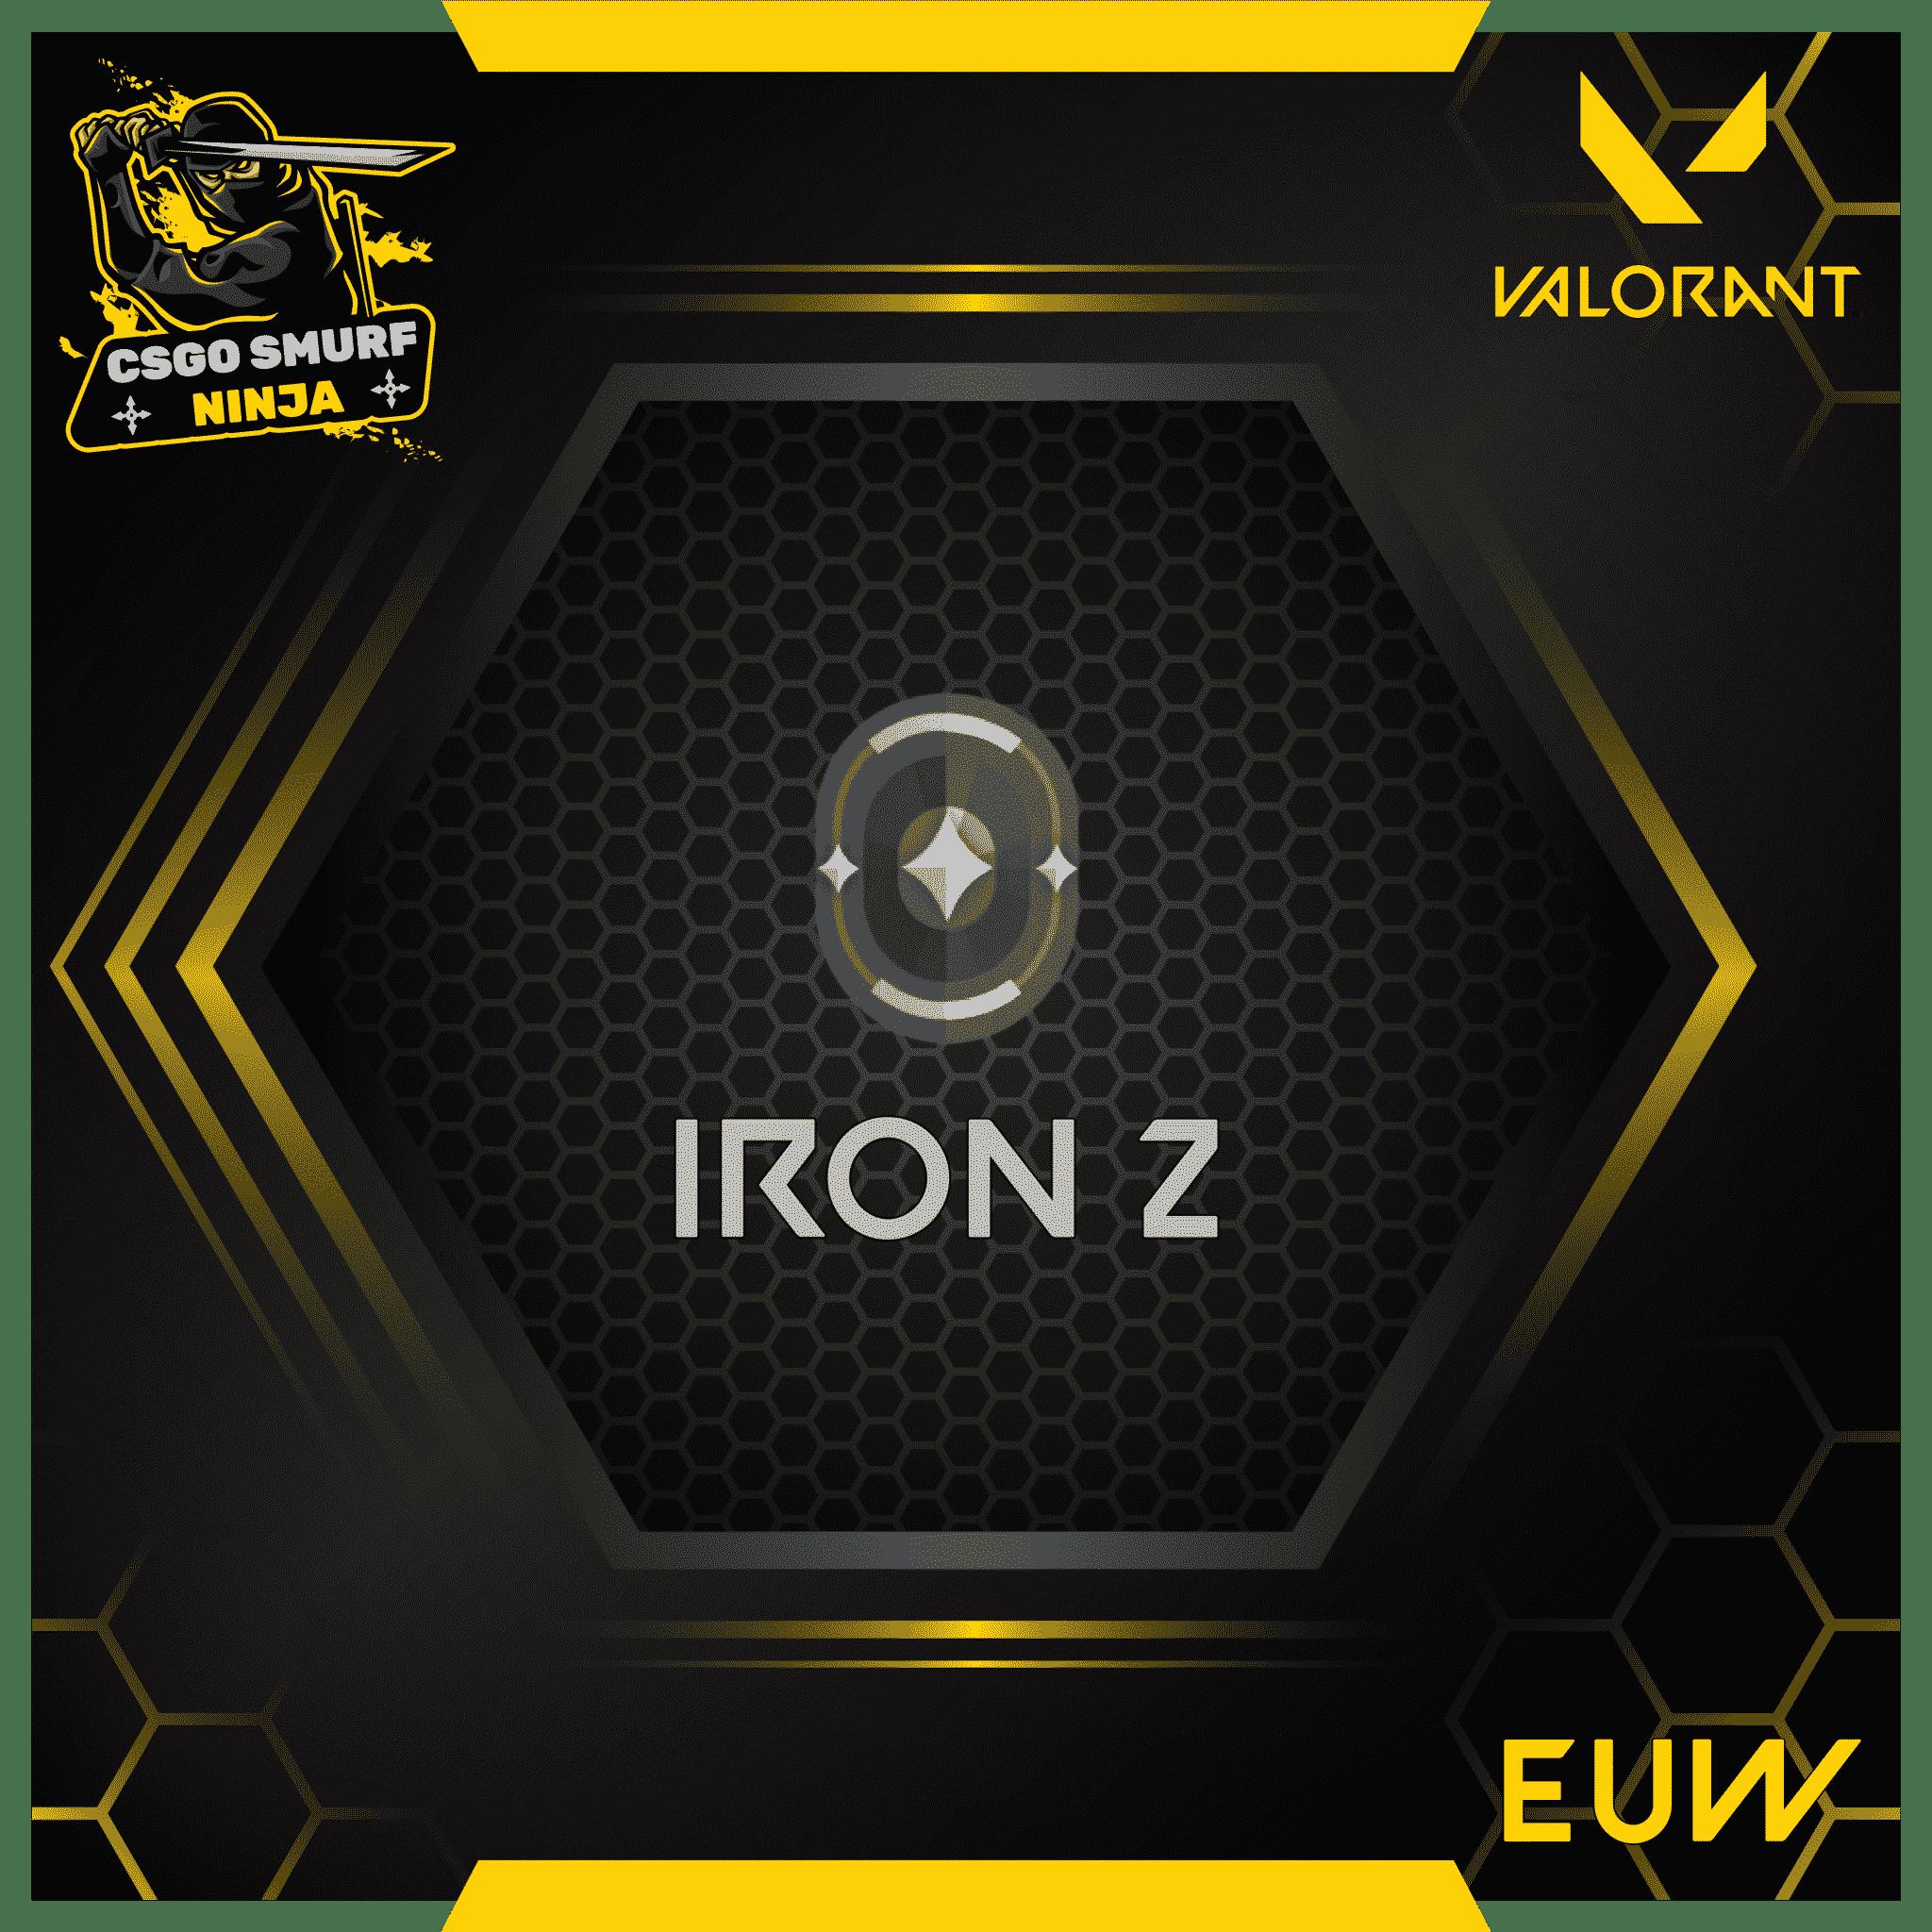 Valorant Iron 2